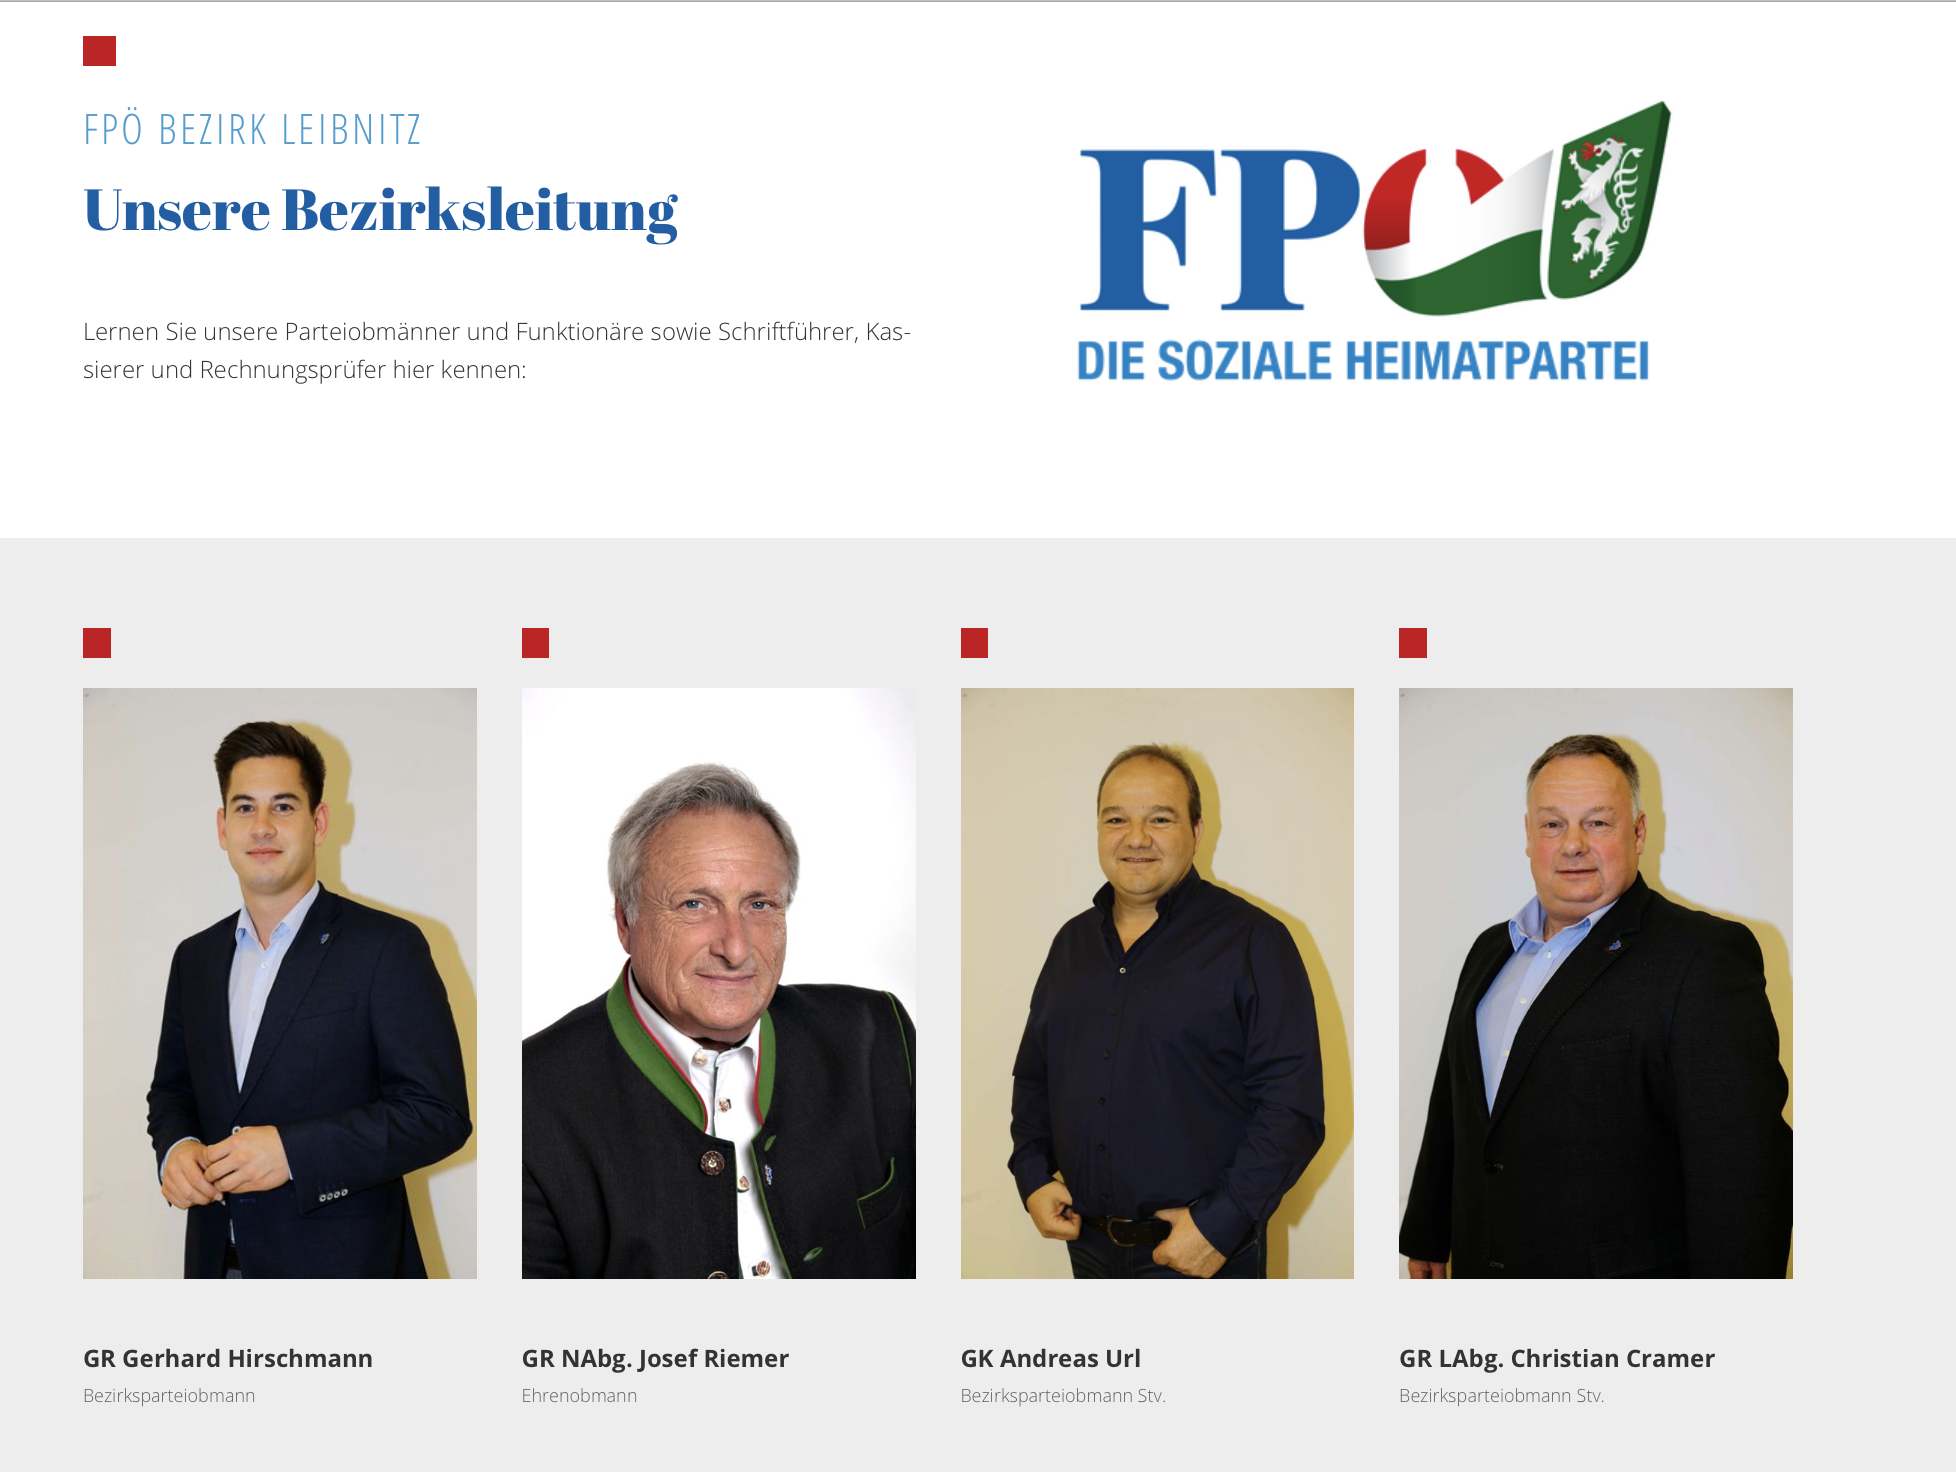 Bezirksparteileitung Leibnitz mit Gerhard Hirschmann (Screenshot 10.5.20 Website FPÖ Leibnitz)